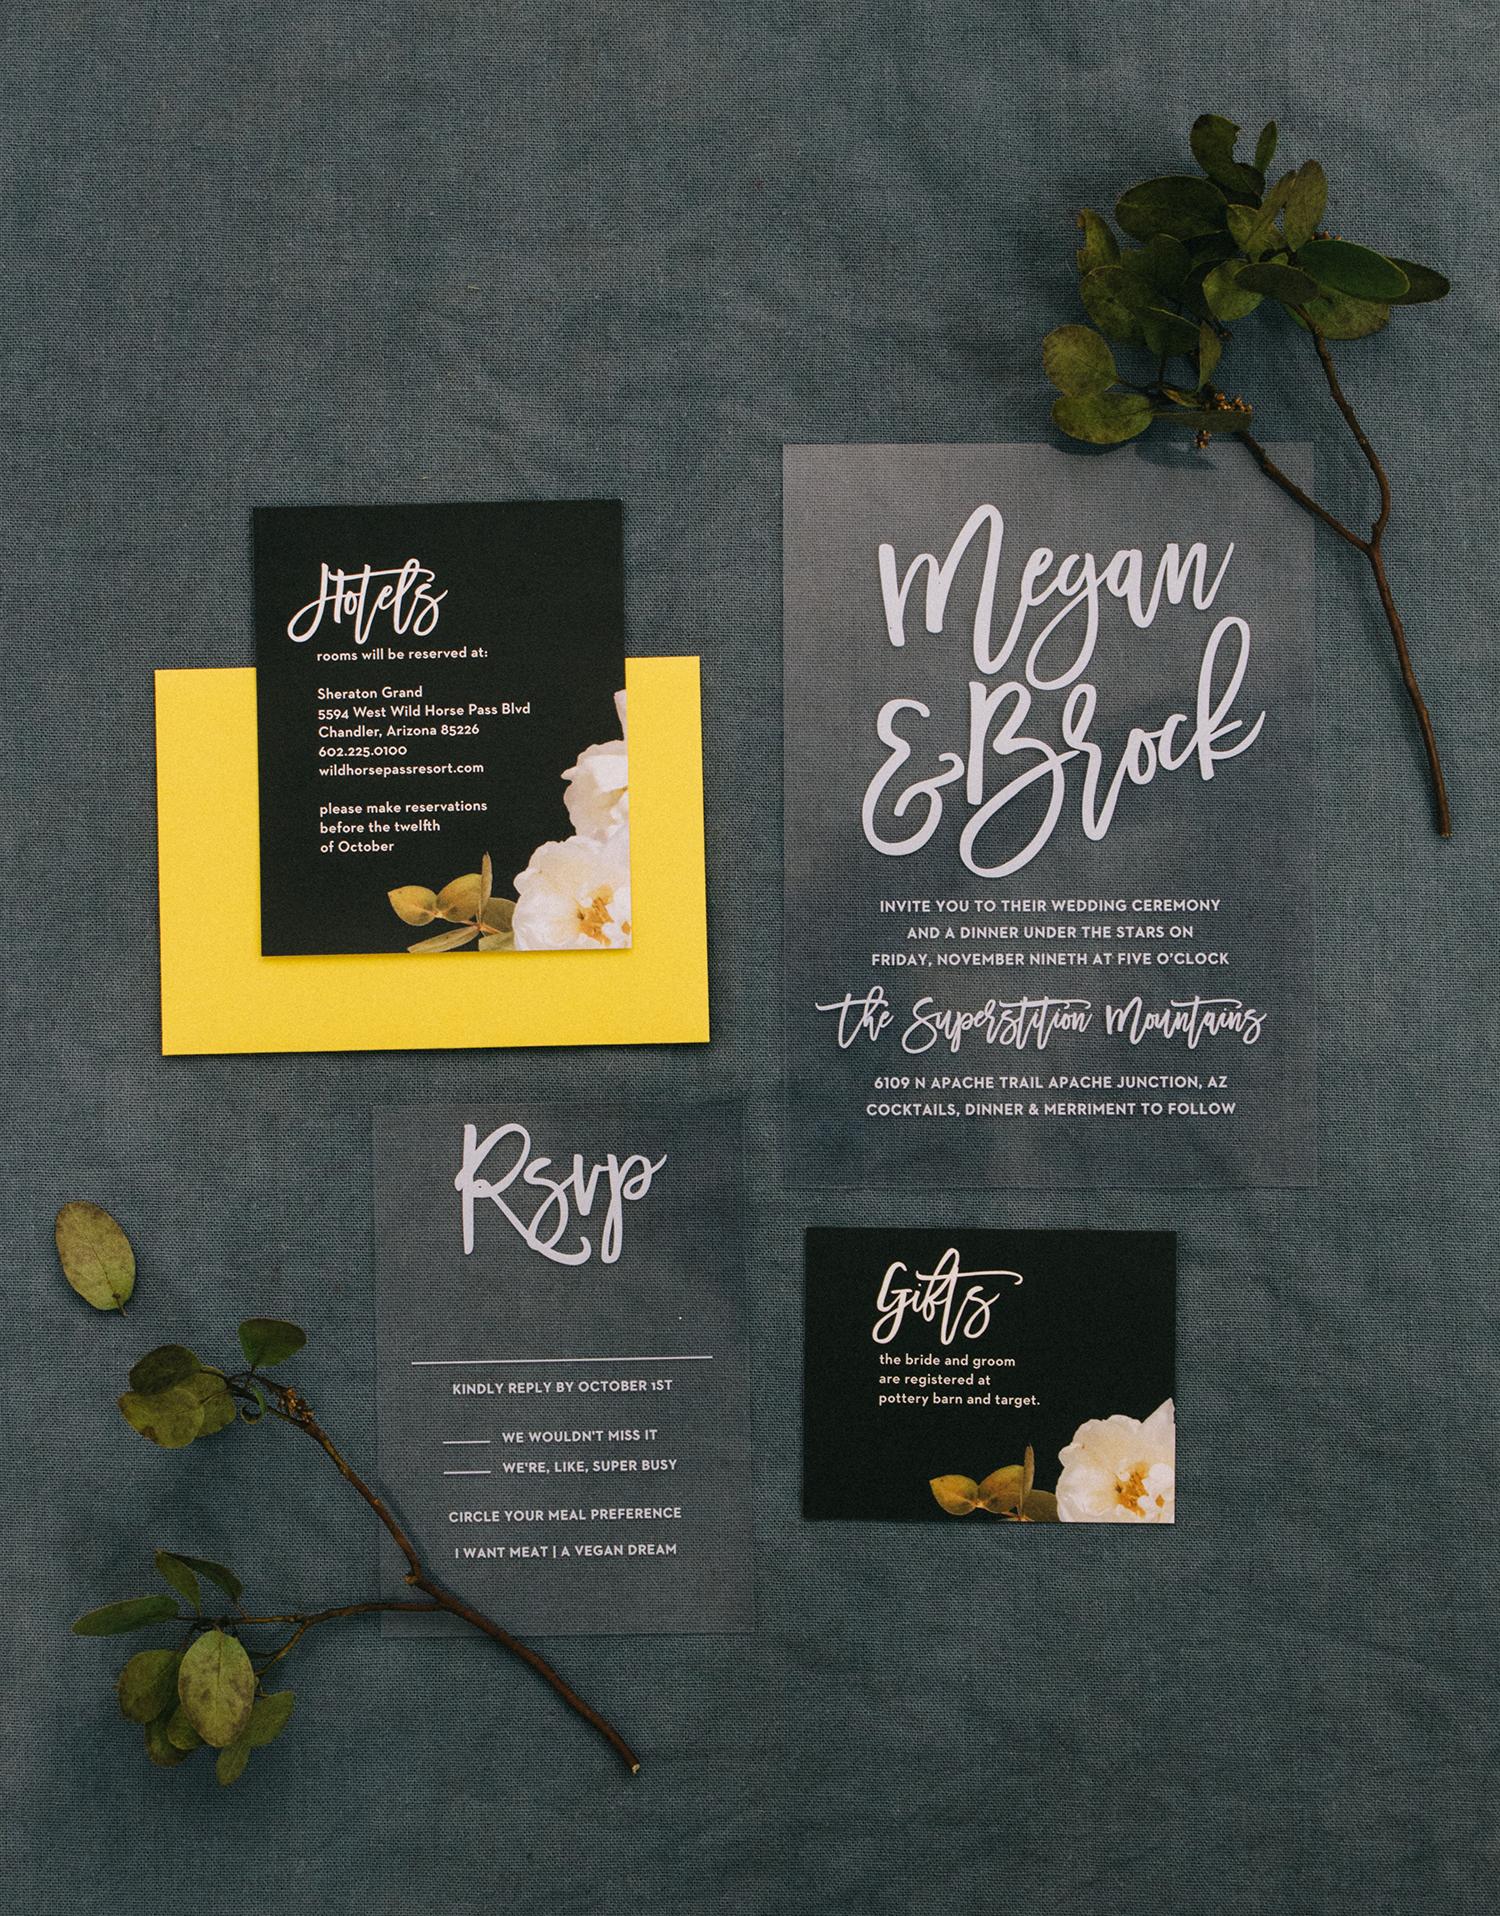 Basic Invite - Acrylic Wedding Invitations